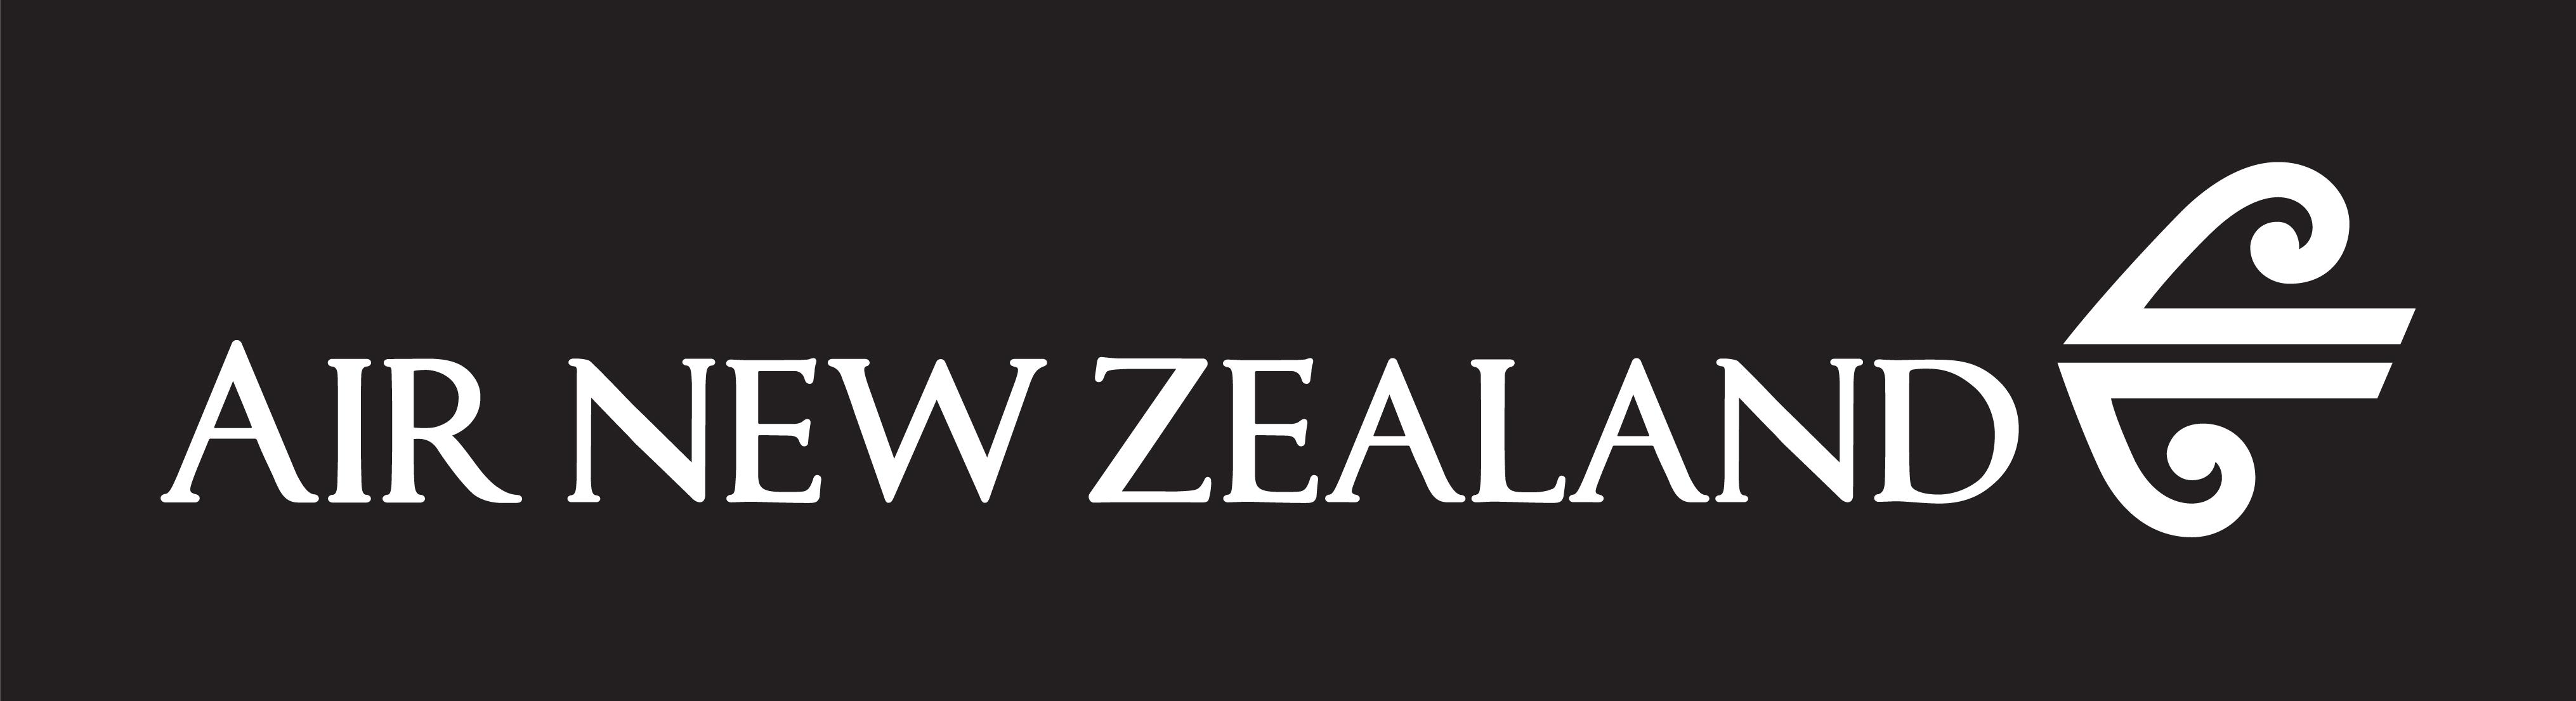 Air New Zealand PNG Transparent Air New Zealand.PNG Images..